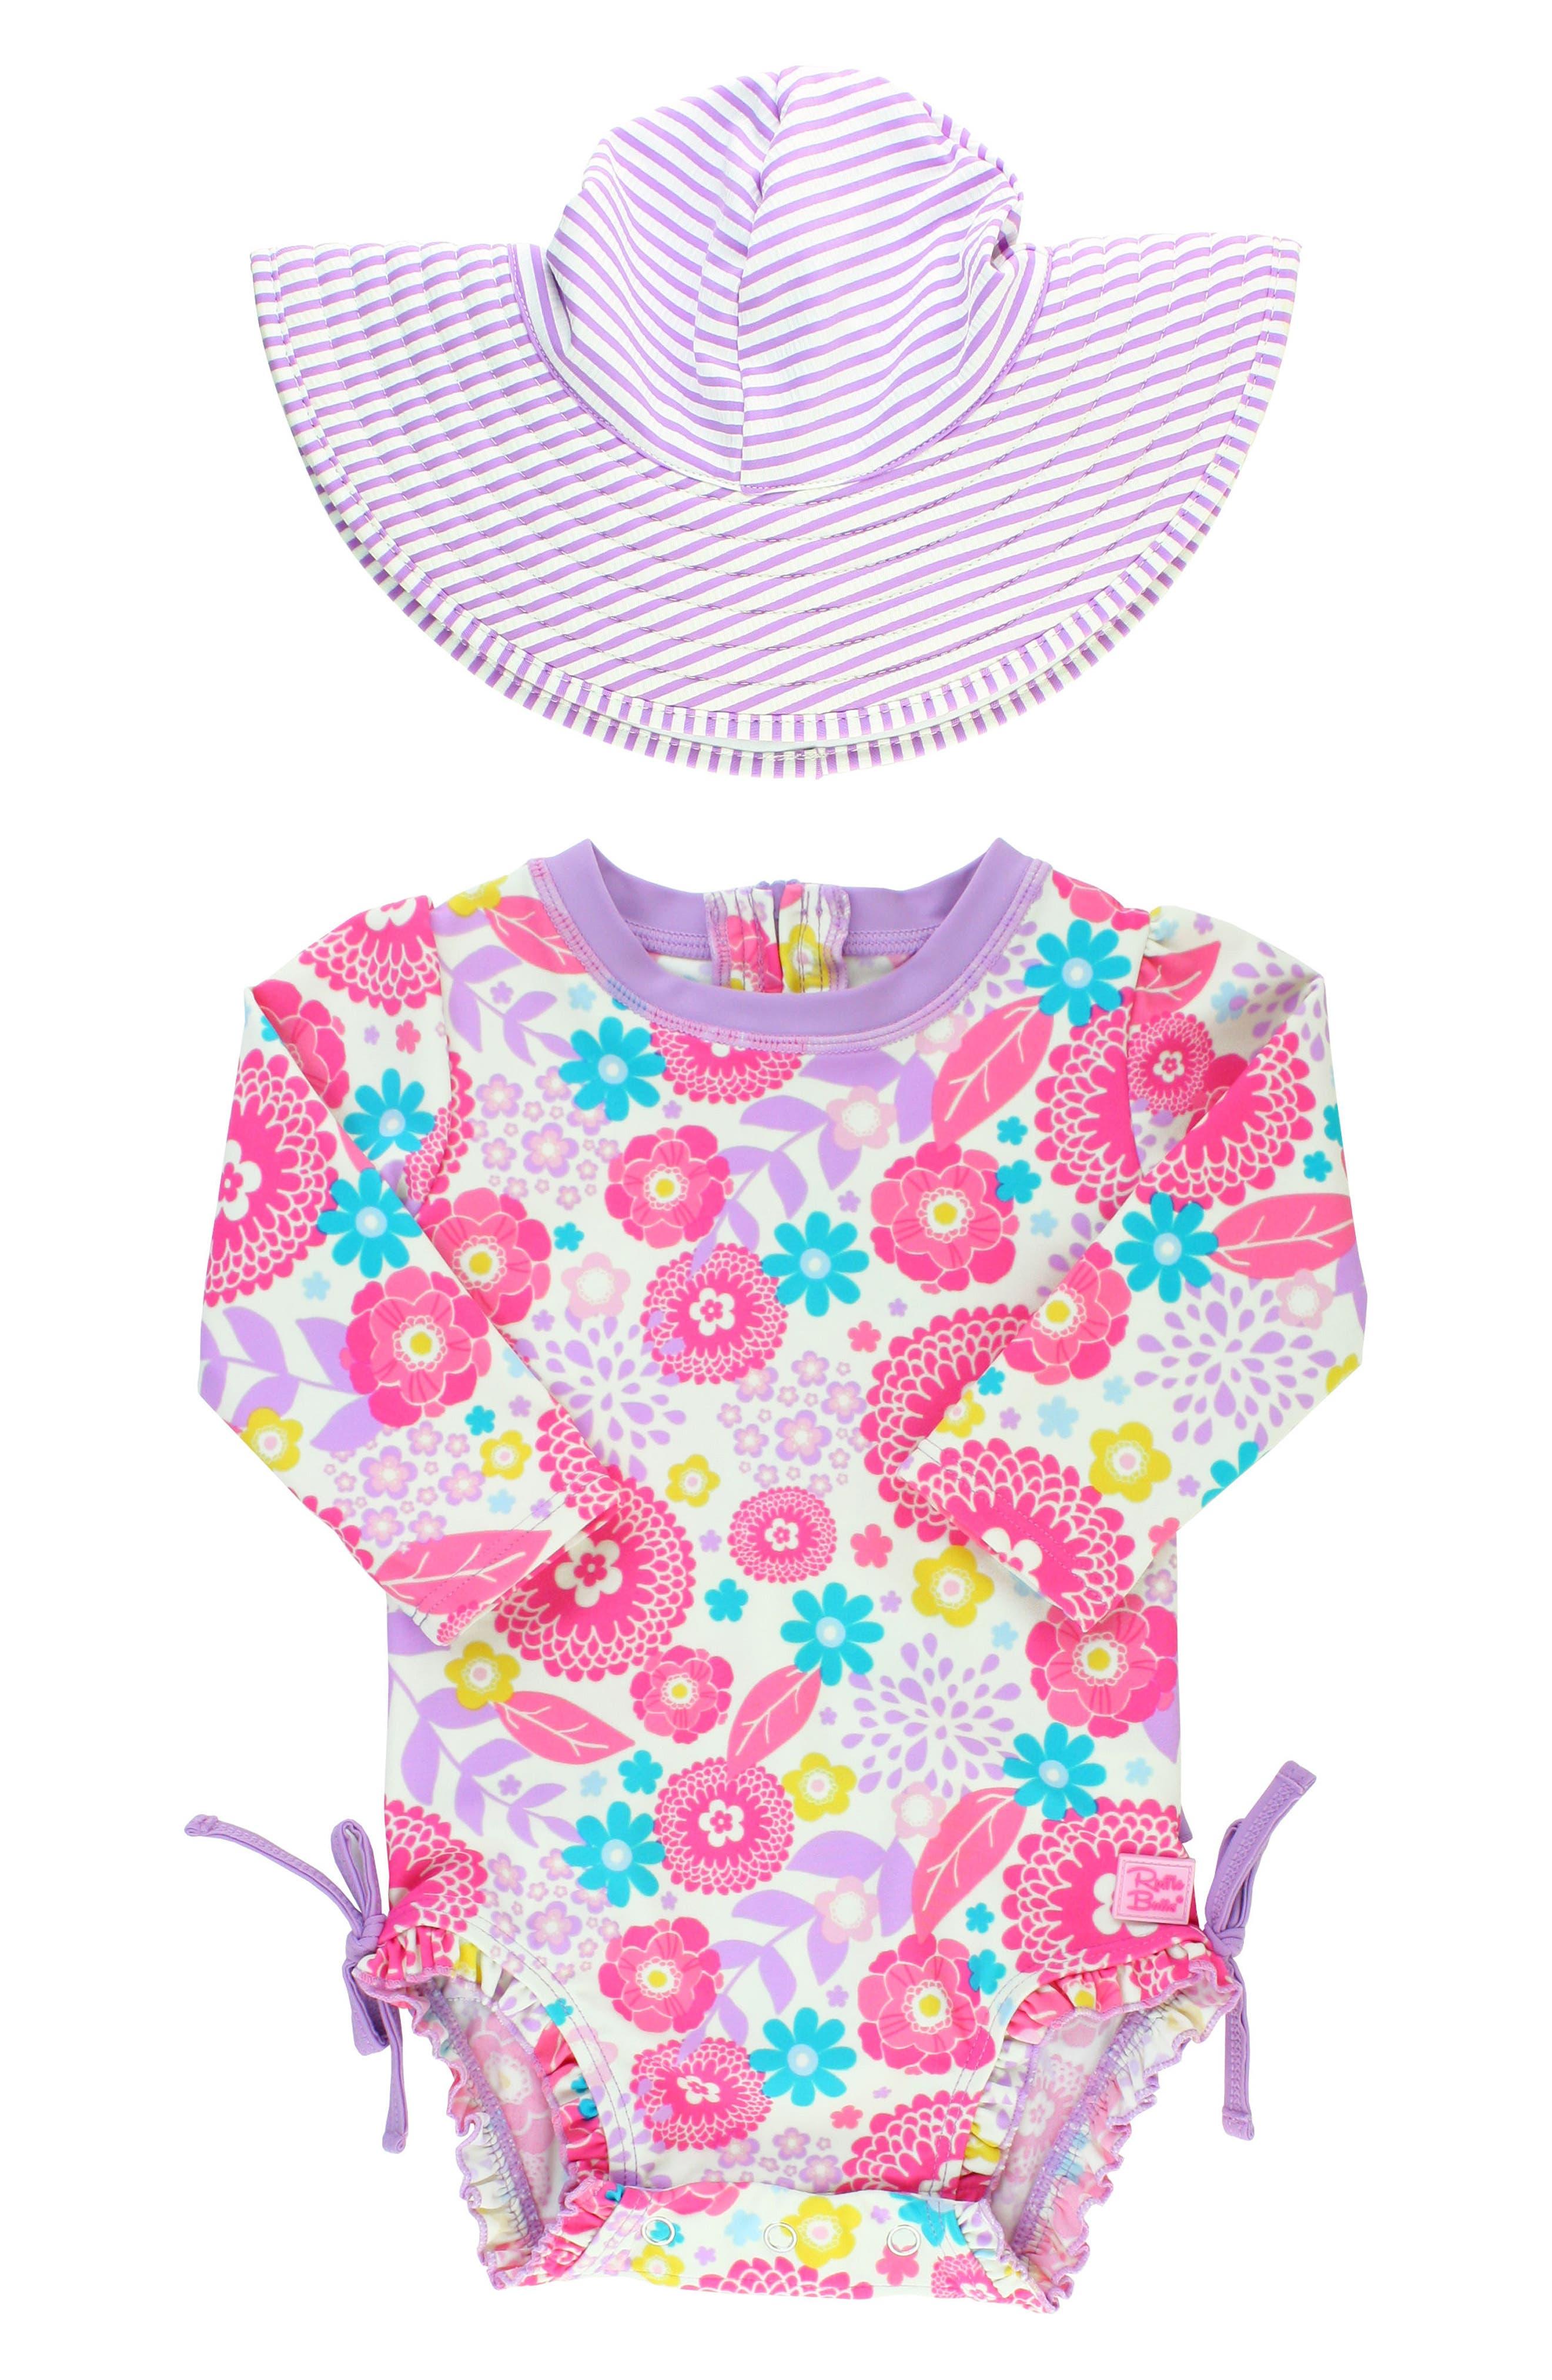 Main Image - RuffleButts Blooming Buttercups One-Piece Rashguard Swimsuit & Hat Set (Baby Girls)